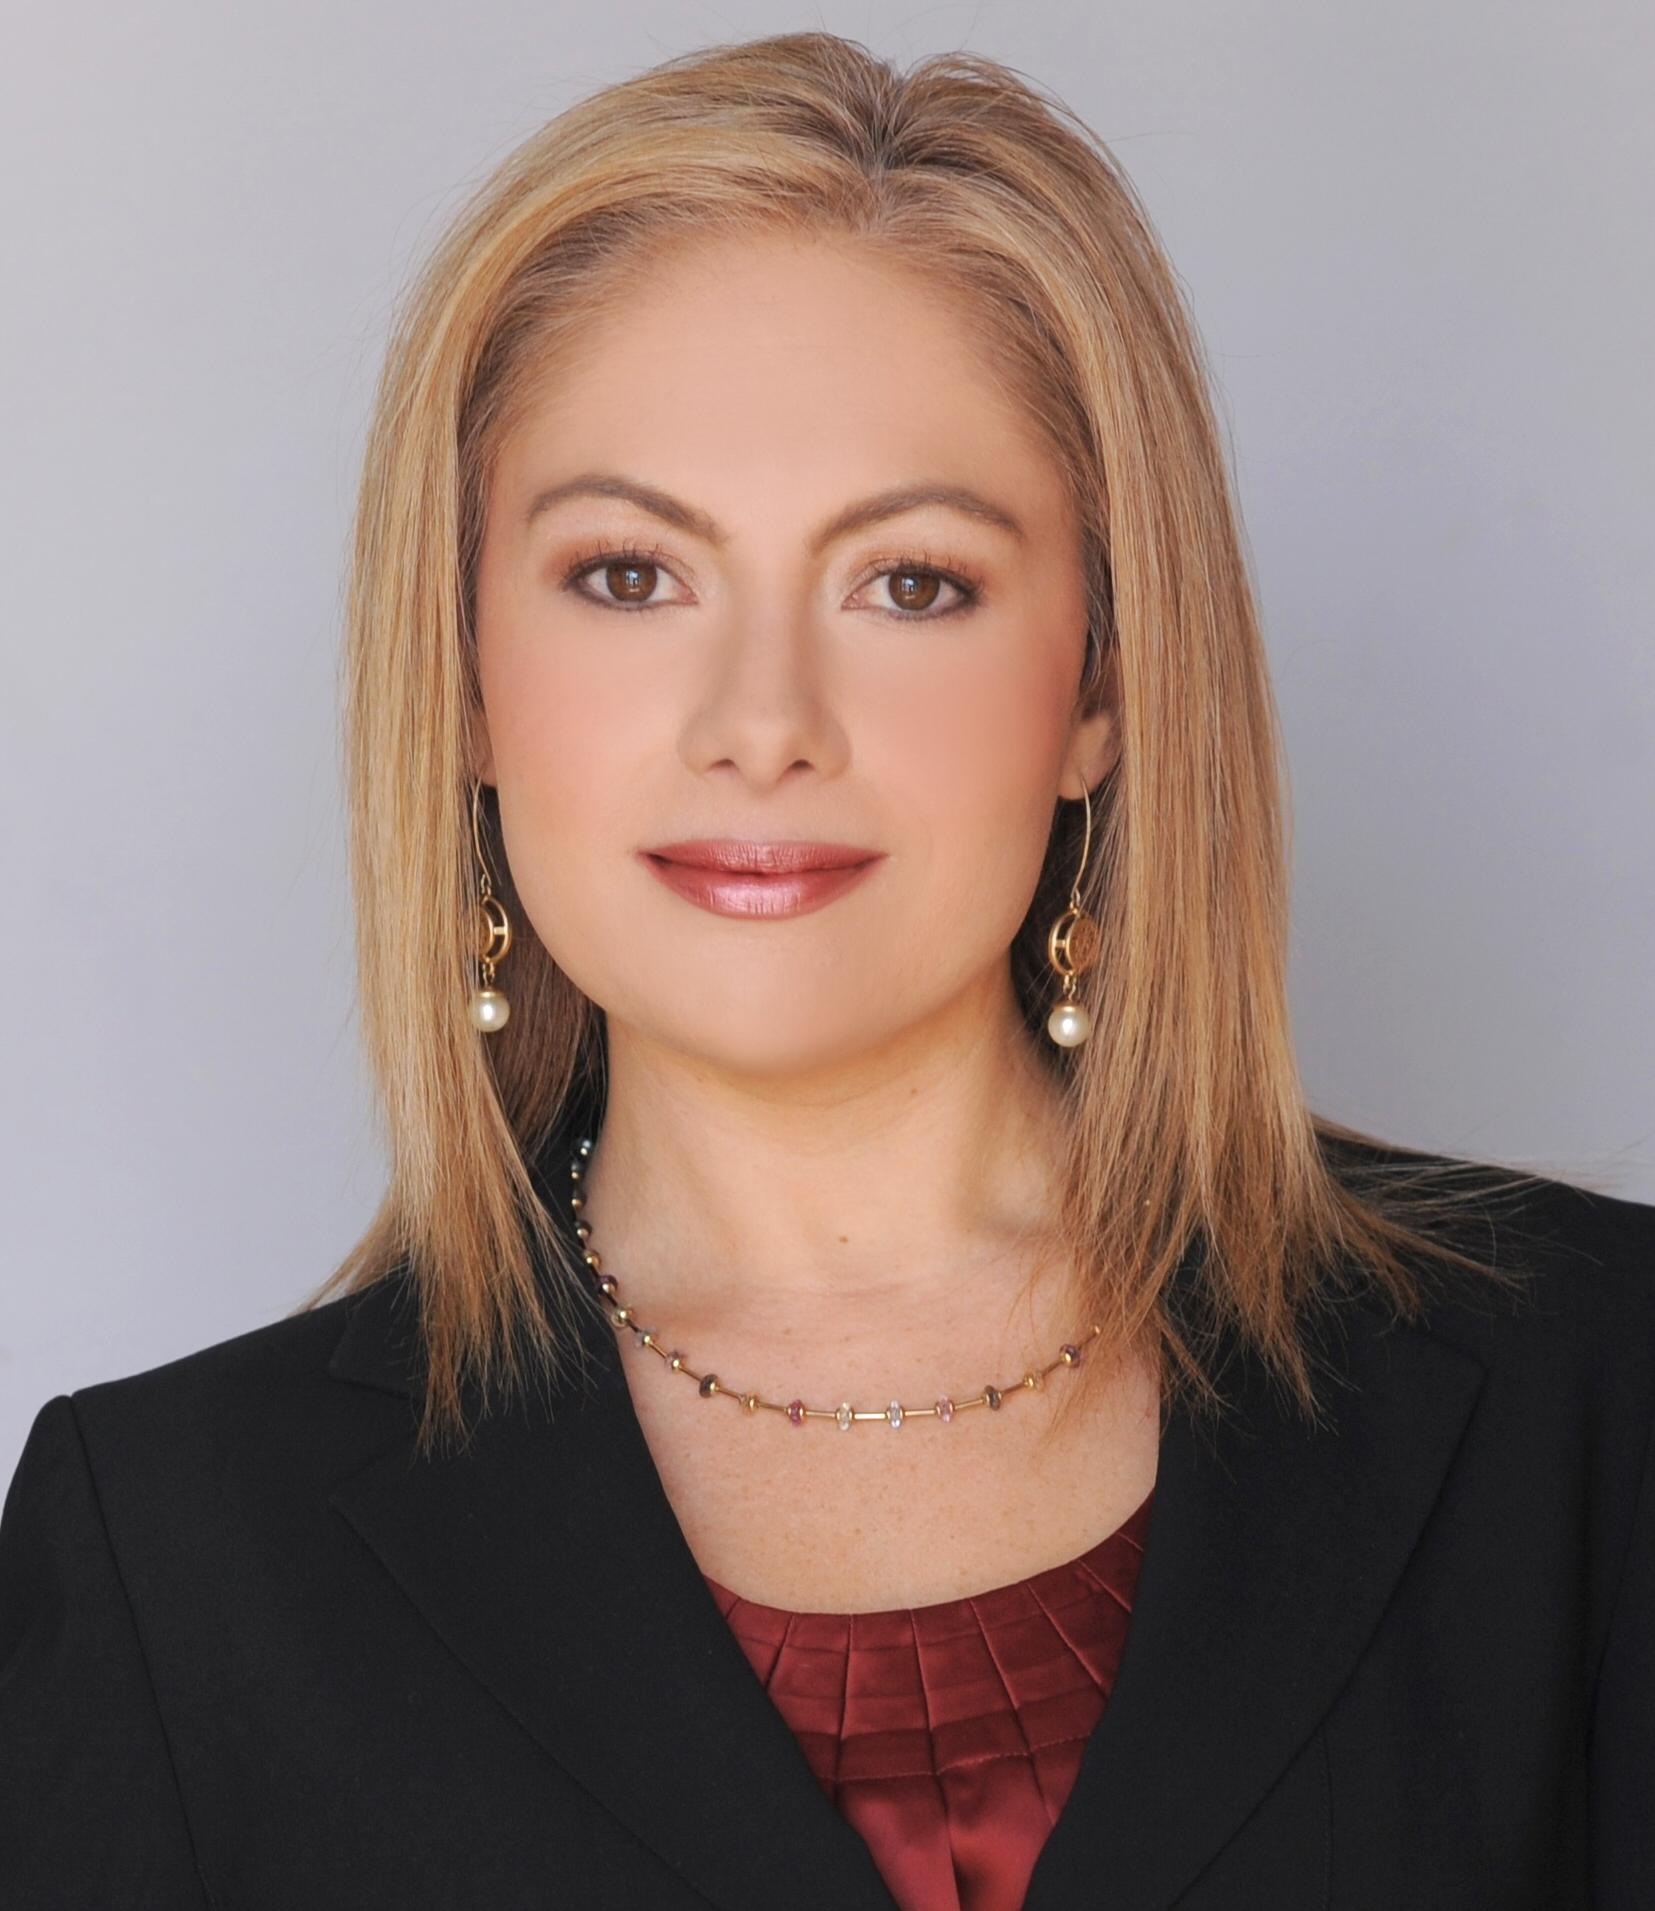 Michelle Baca